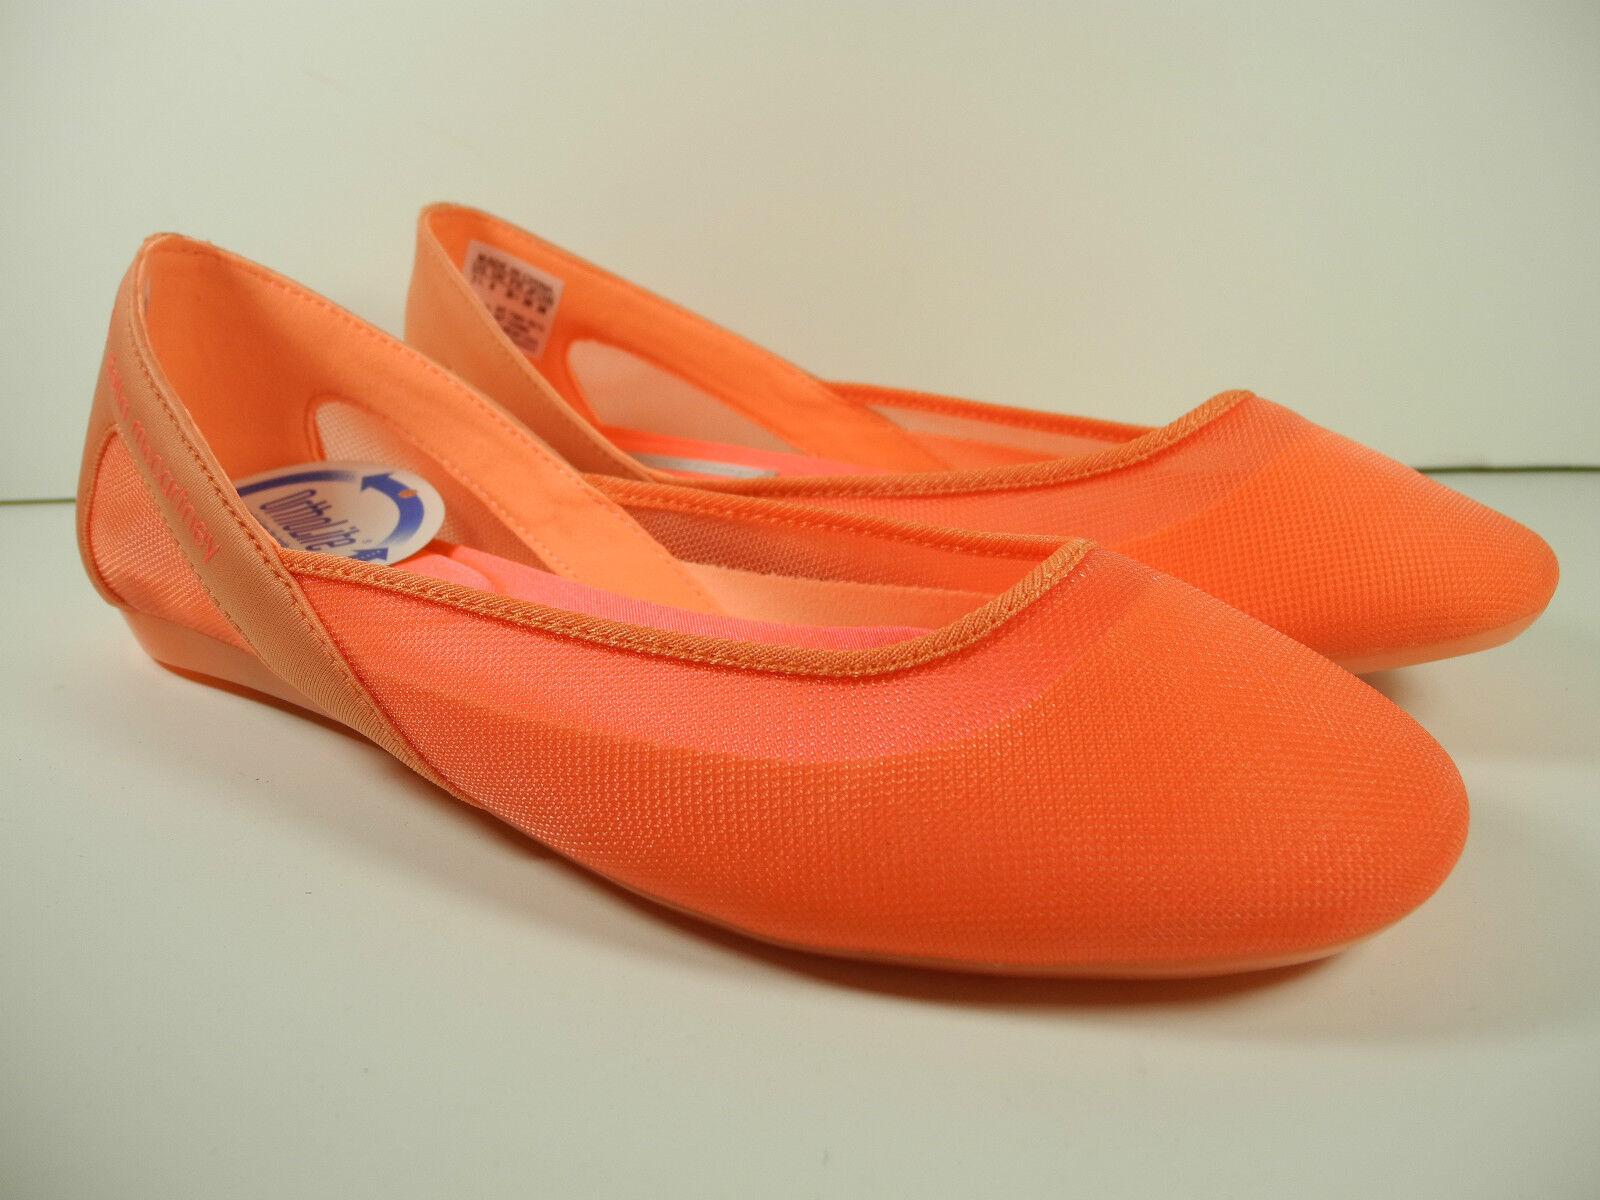 NEW Stella Mccartney ITRAN BALLERINA by Adidas shoes Flats US 6